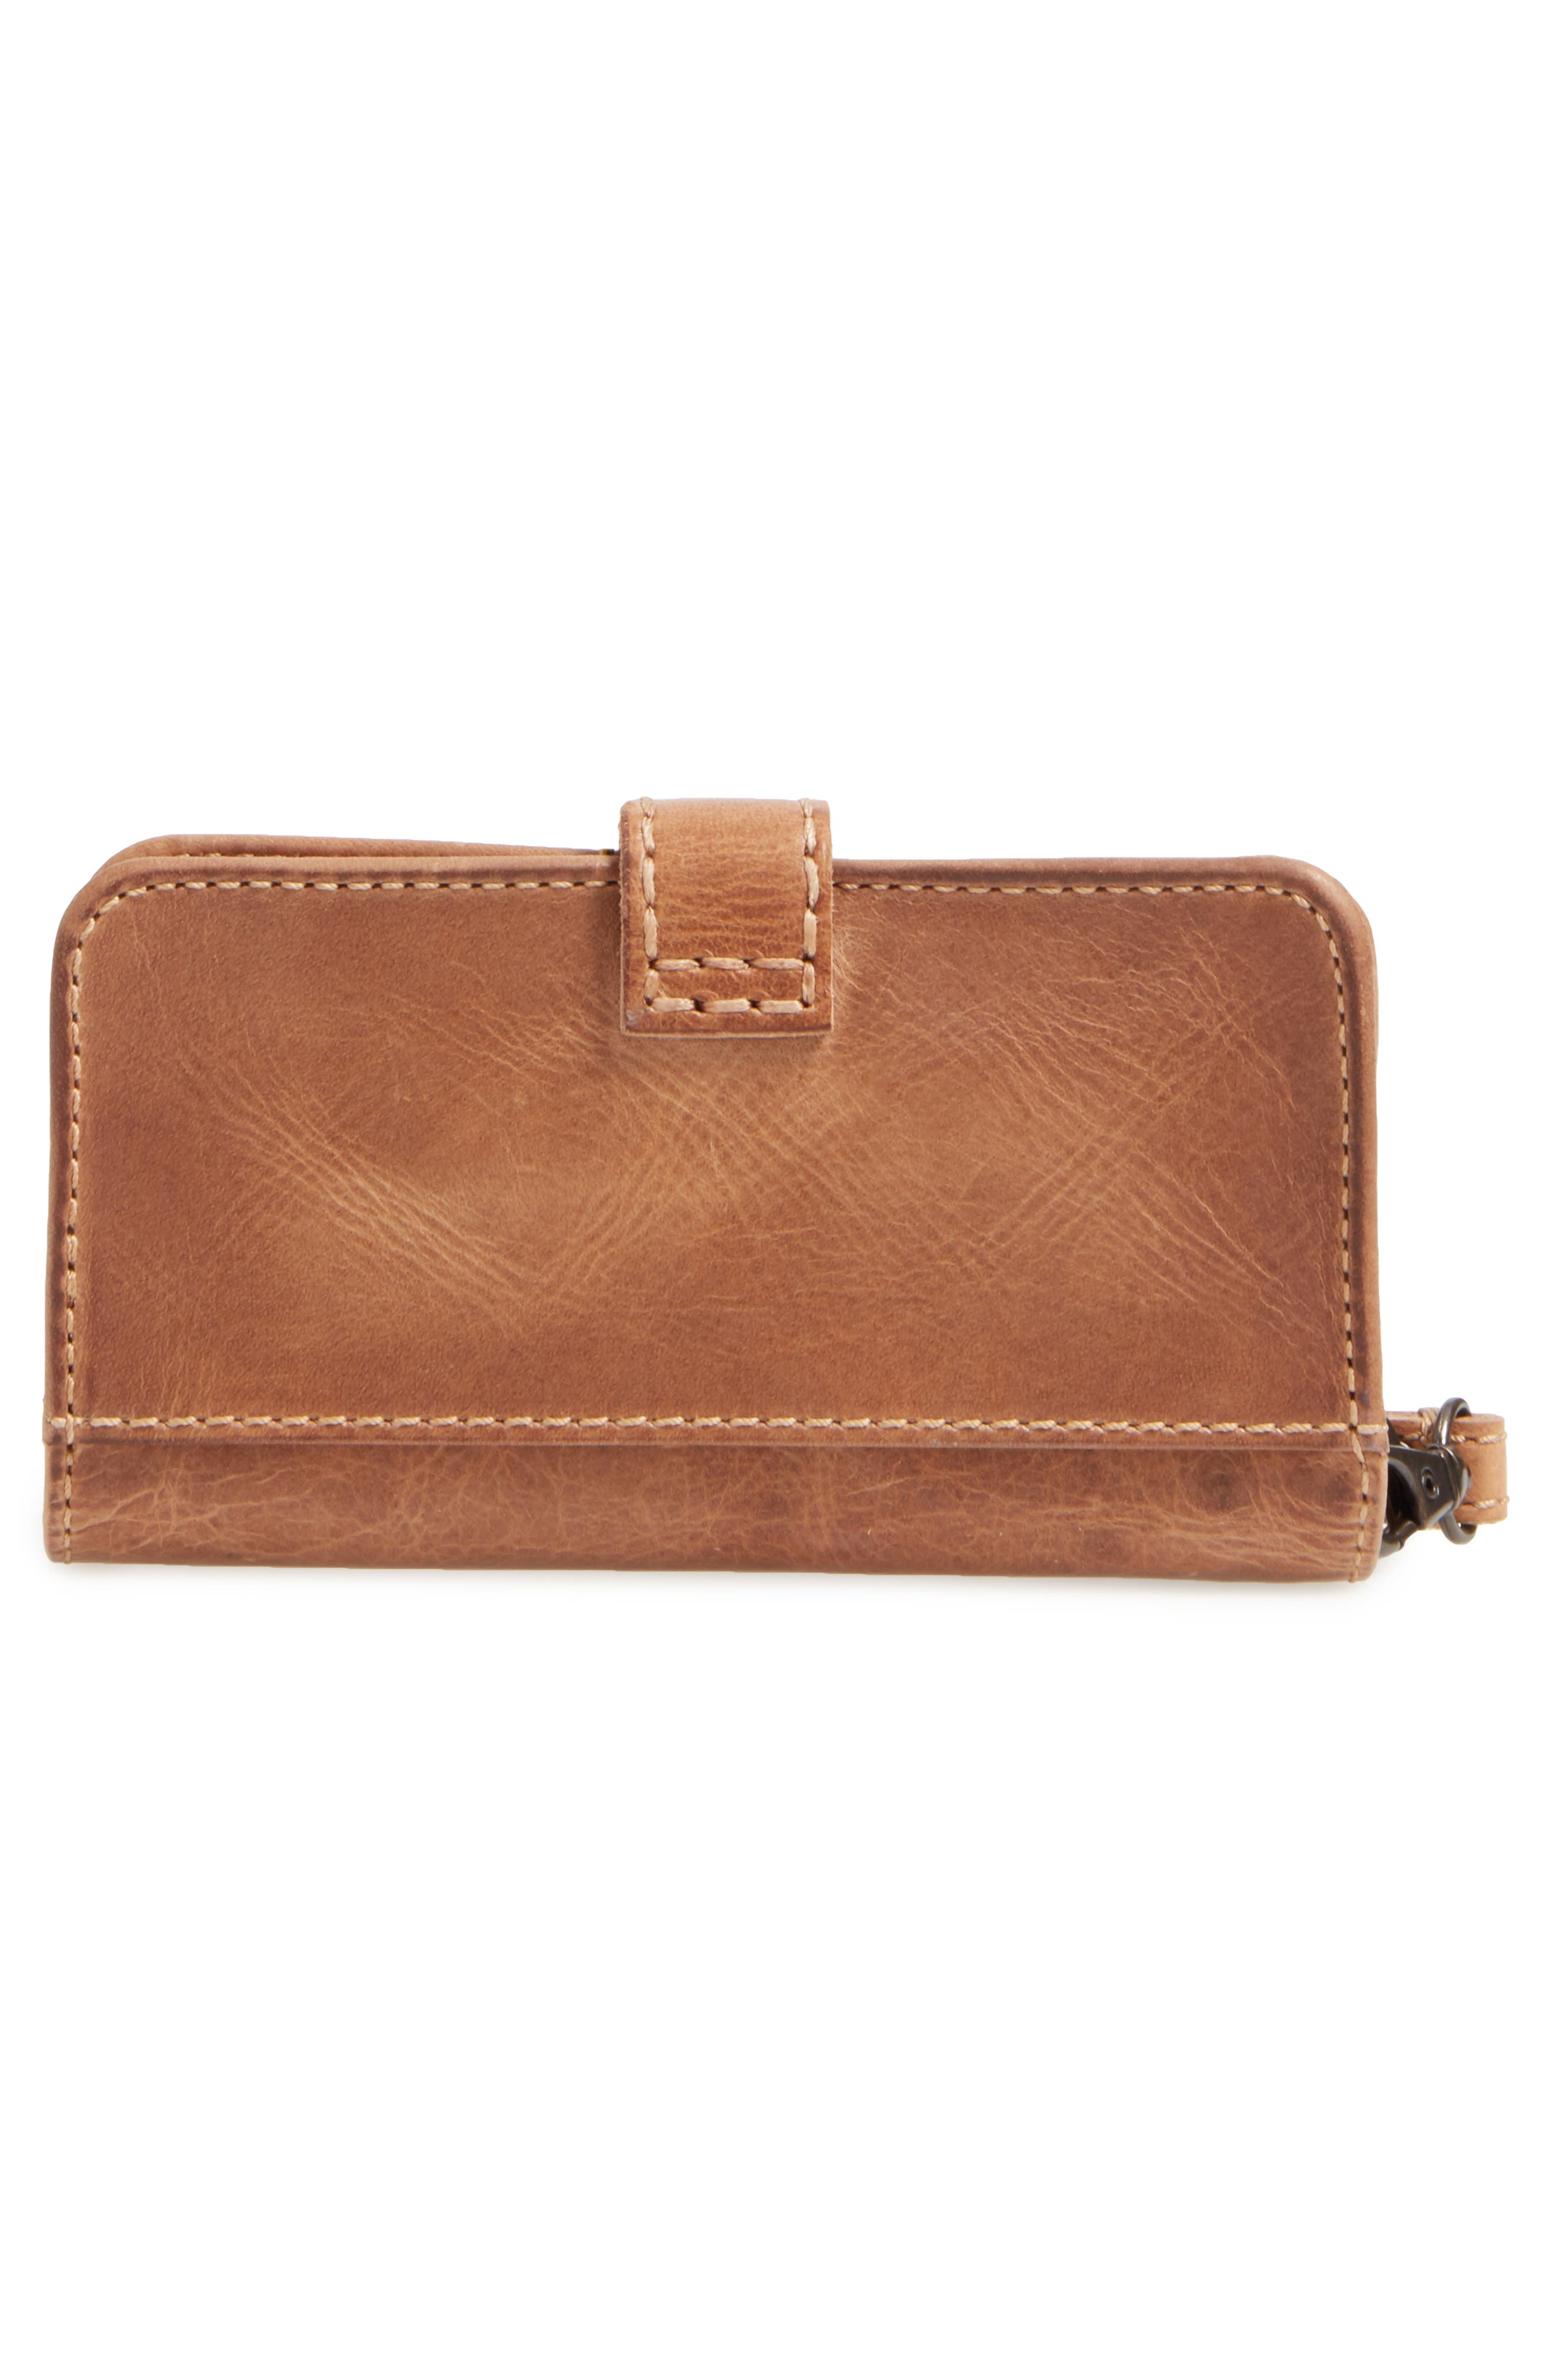 'Melissa' Leather Phone Wallet,                             Alternate thumbnail 3, color,                             Beige